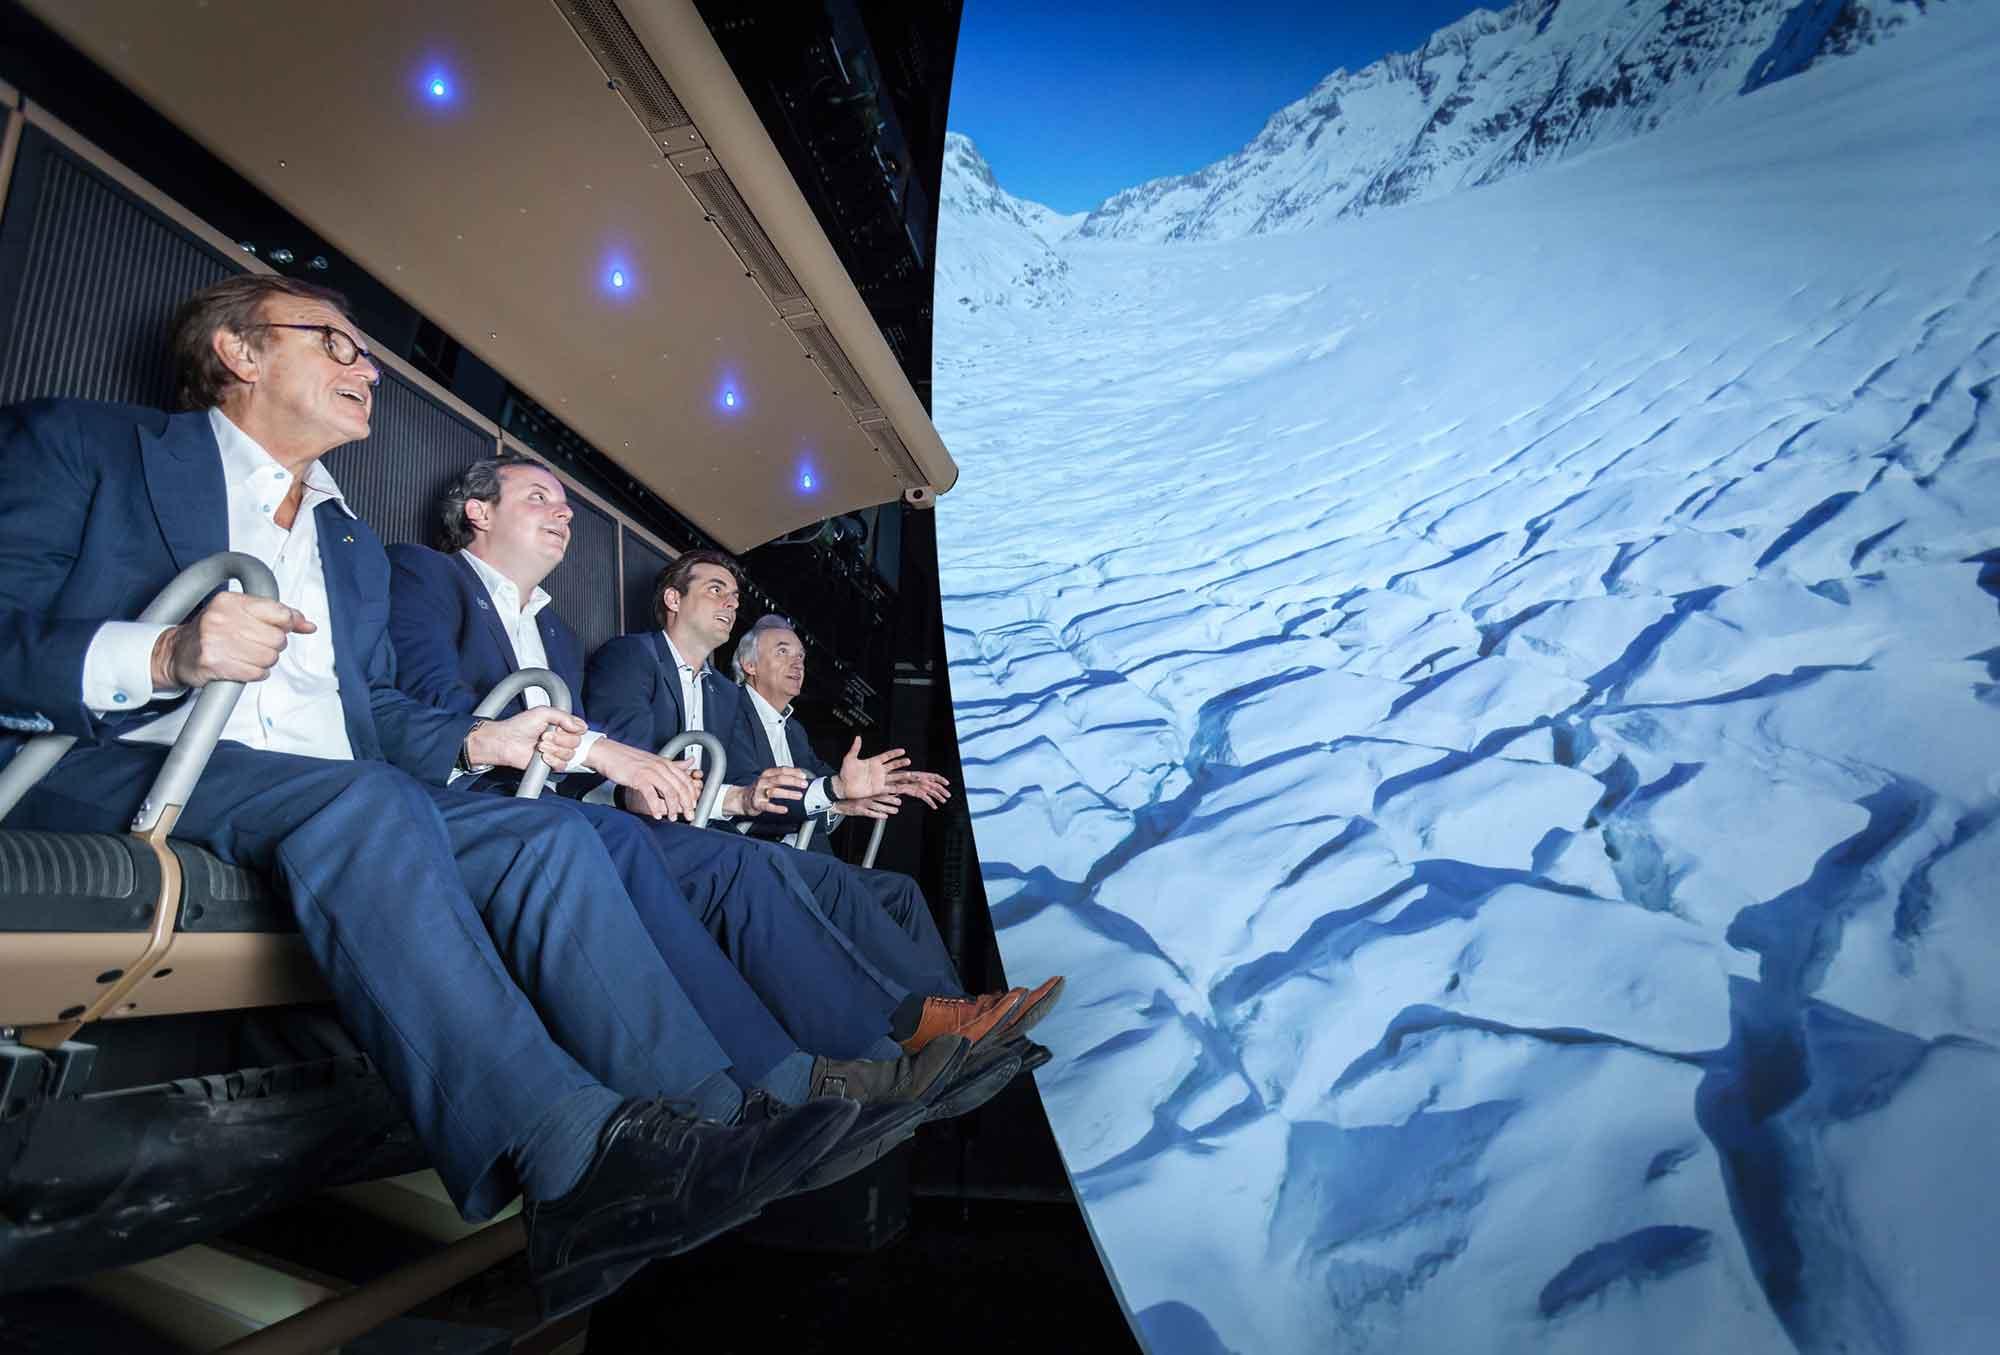 Voletarium – Europe's largest flying theatre at Europa-Park